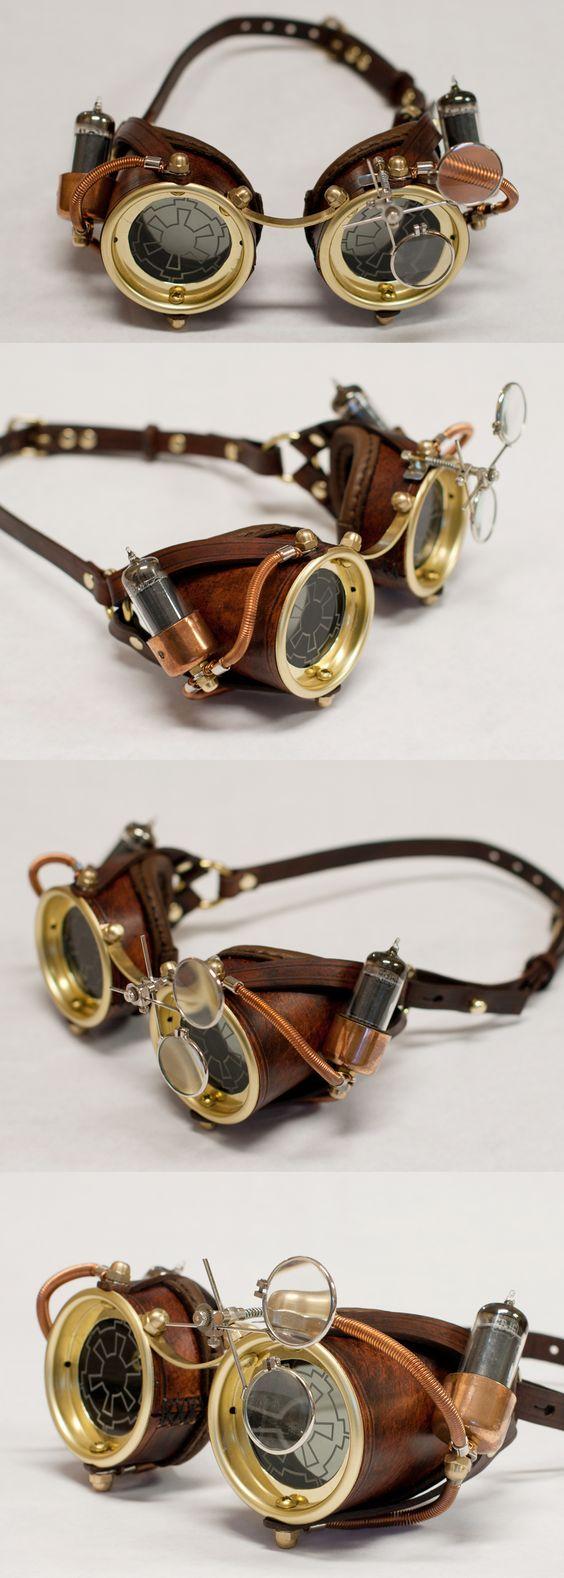 Ocular Enhancers - Steampunk Goggles by asdemeladen.deviantart.com on @deviantART - Monde Du Loisir - www.mondeduloisir.fr                                                                                                                                                      Plus                                                                                                                                                     Plus